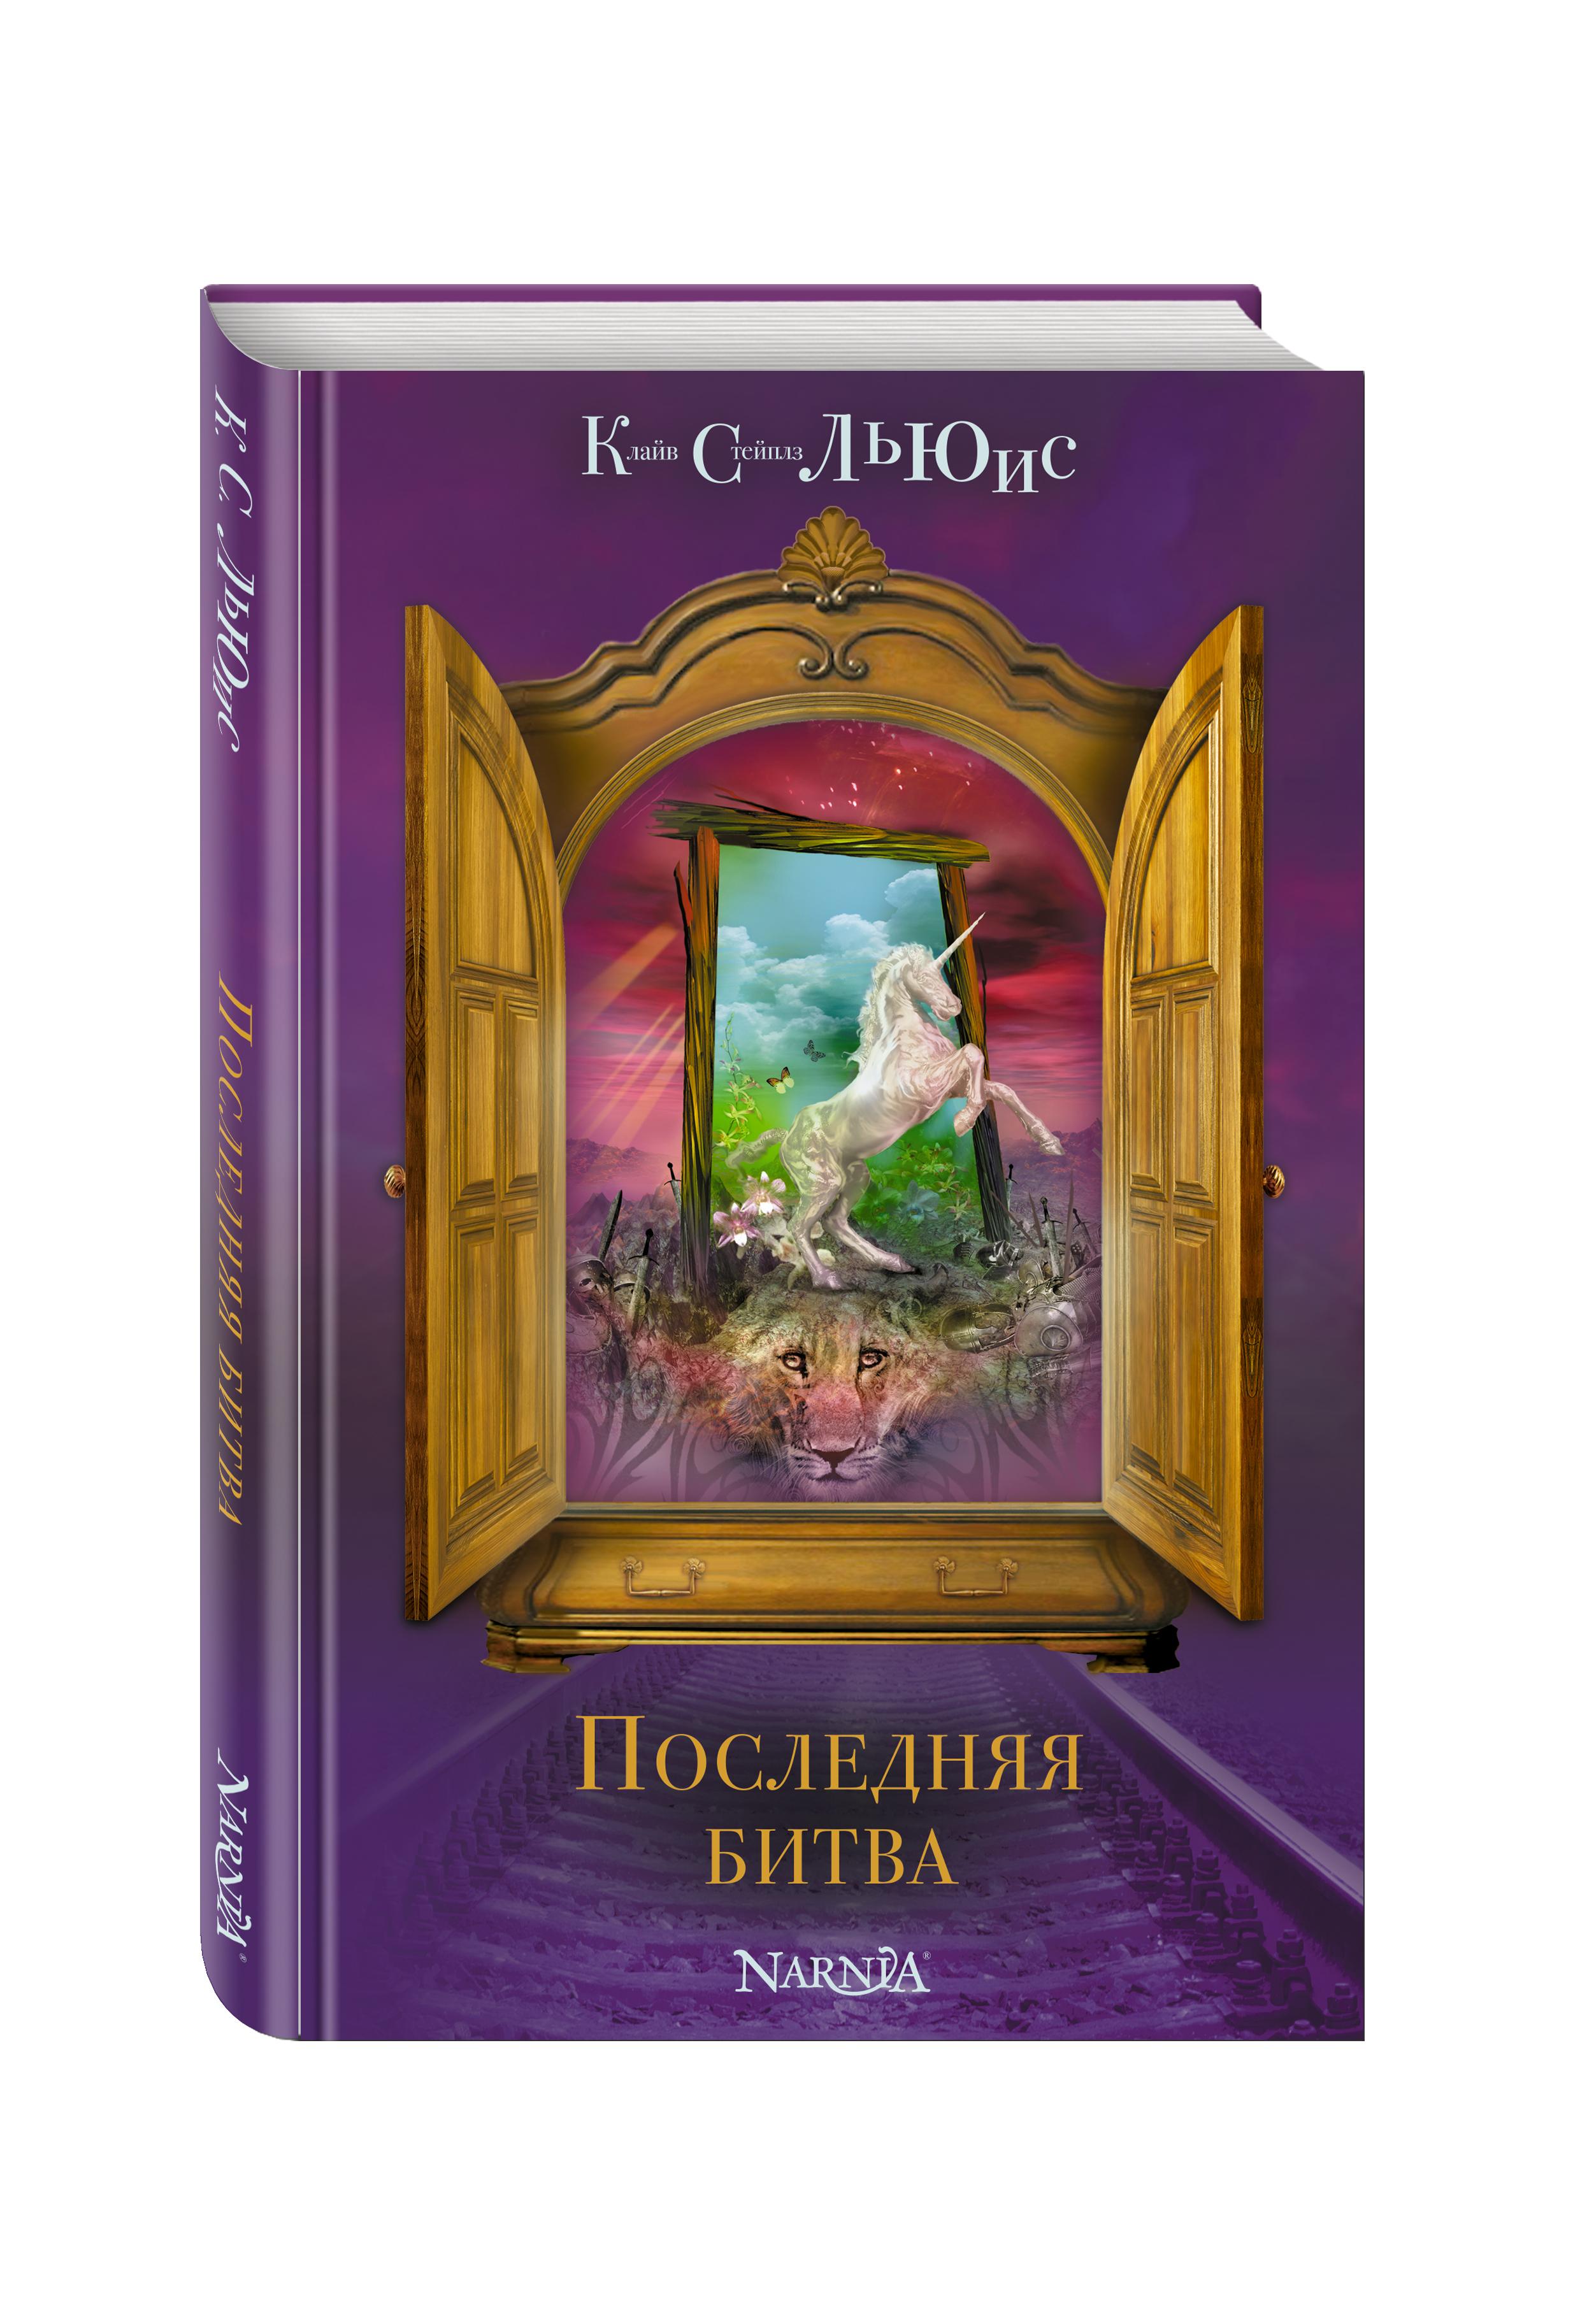 Клайв С. Льюис Последняя битва (ст. изд.) битва богов 2018 10 17t17 00